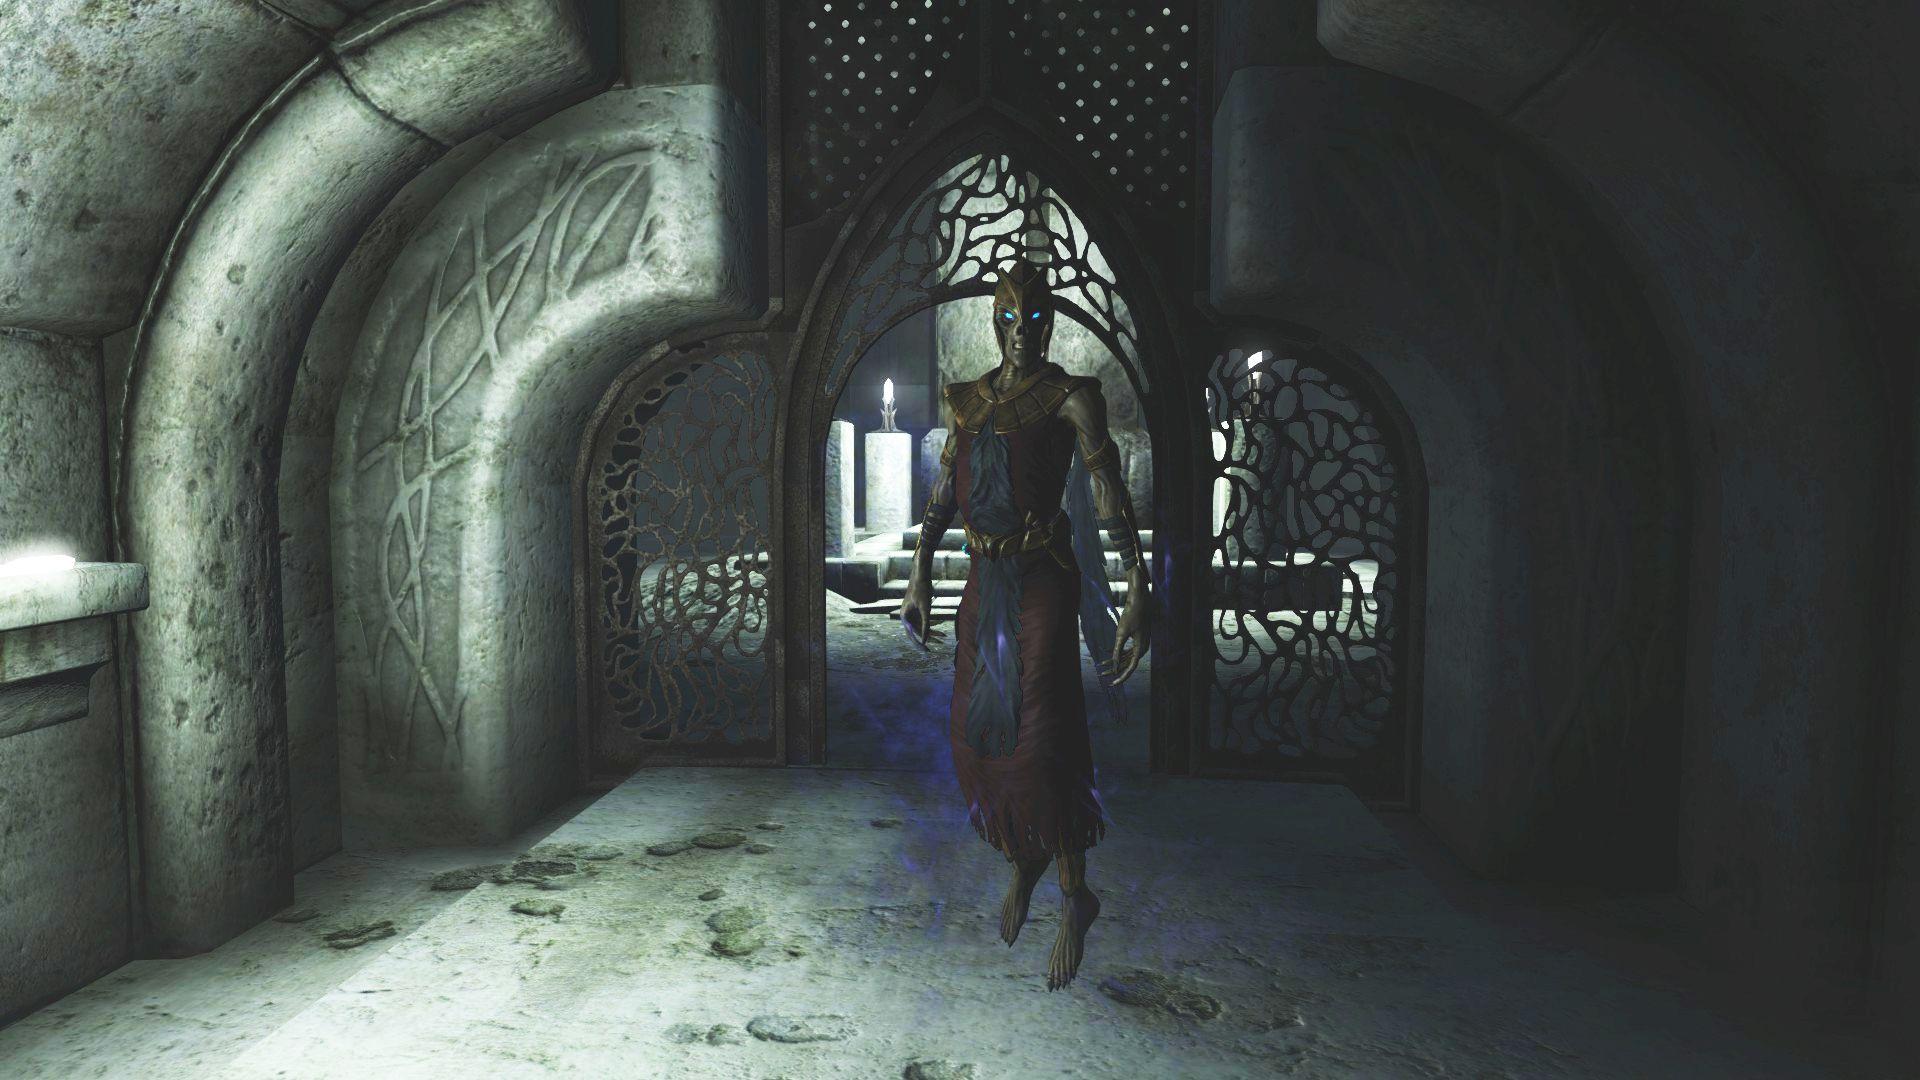 The Beyond Skyrim mod's new trailer shows off Oblivion's